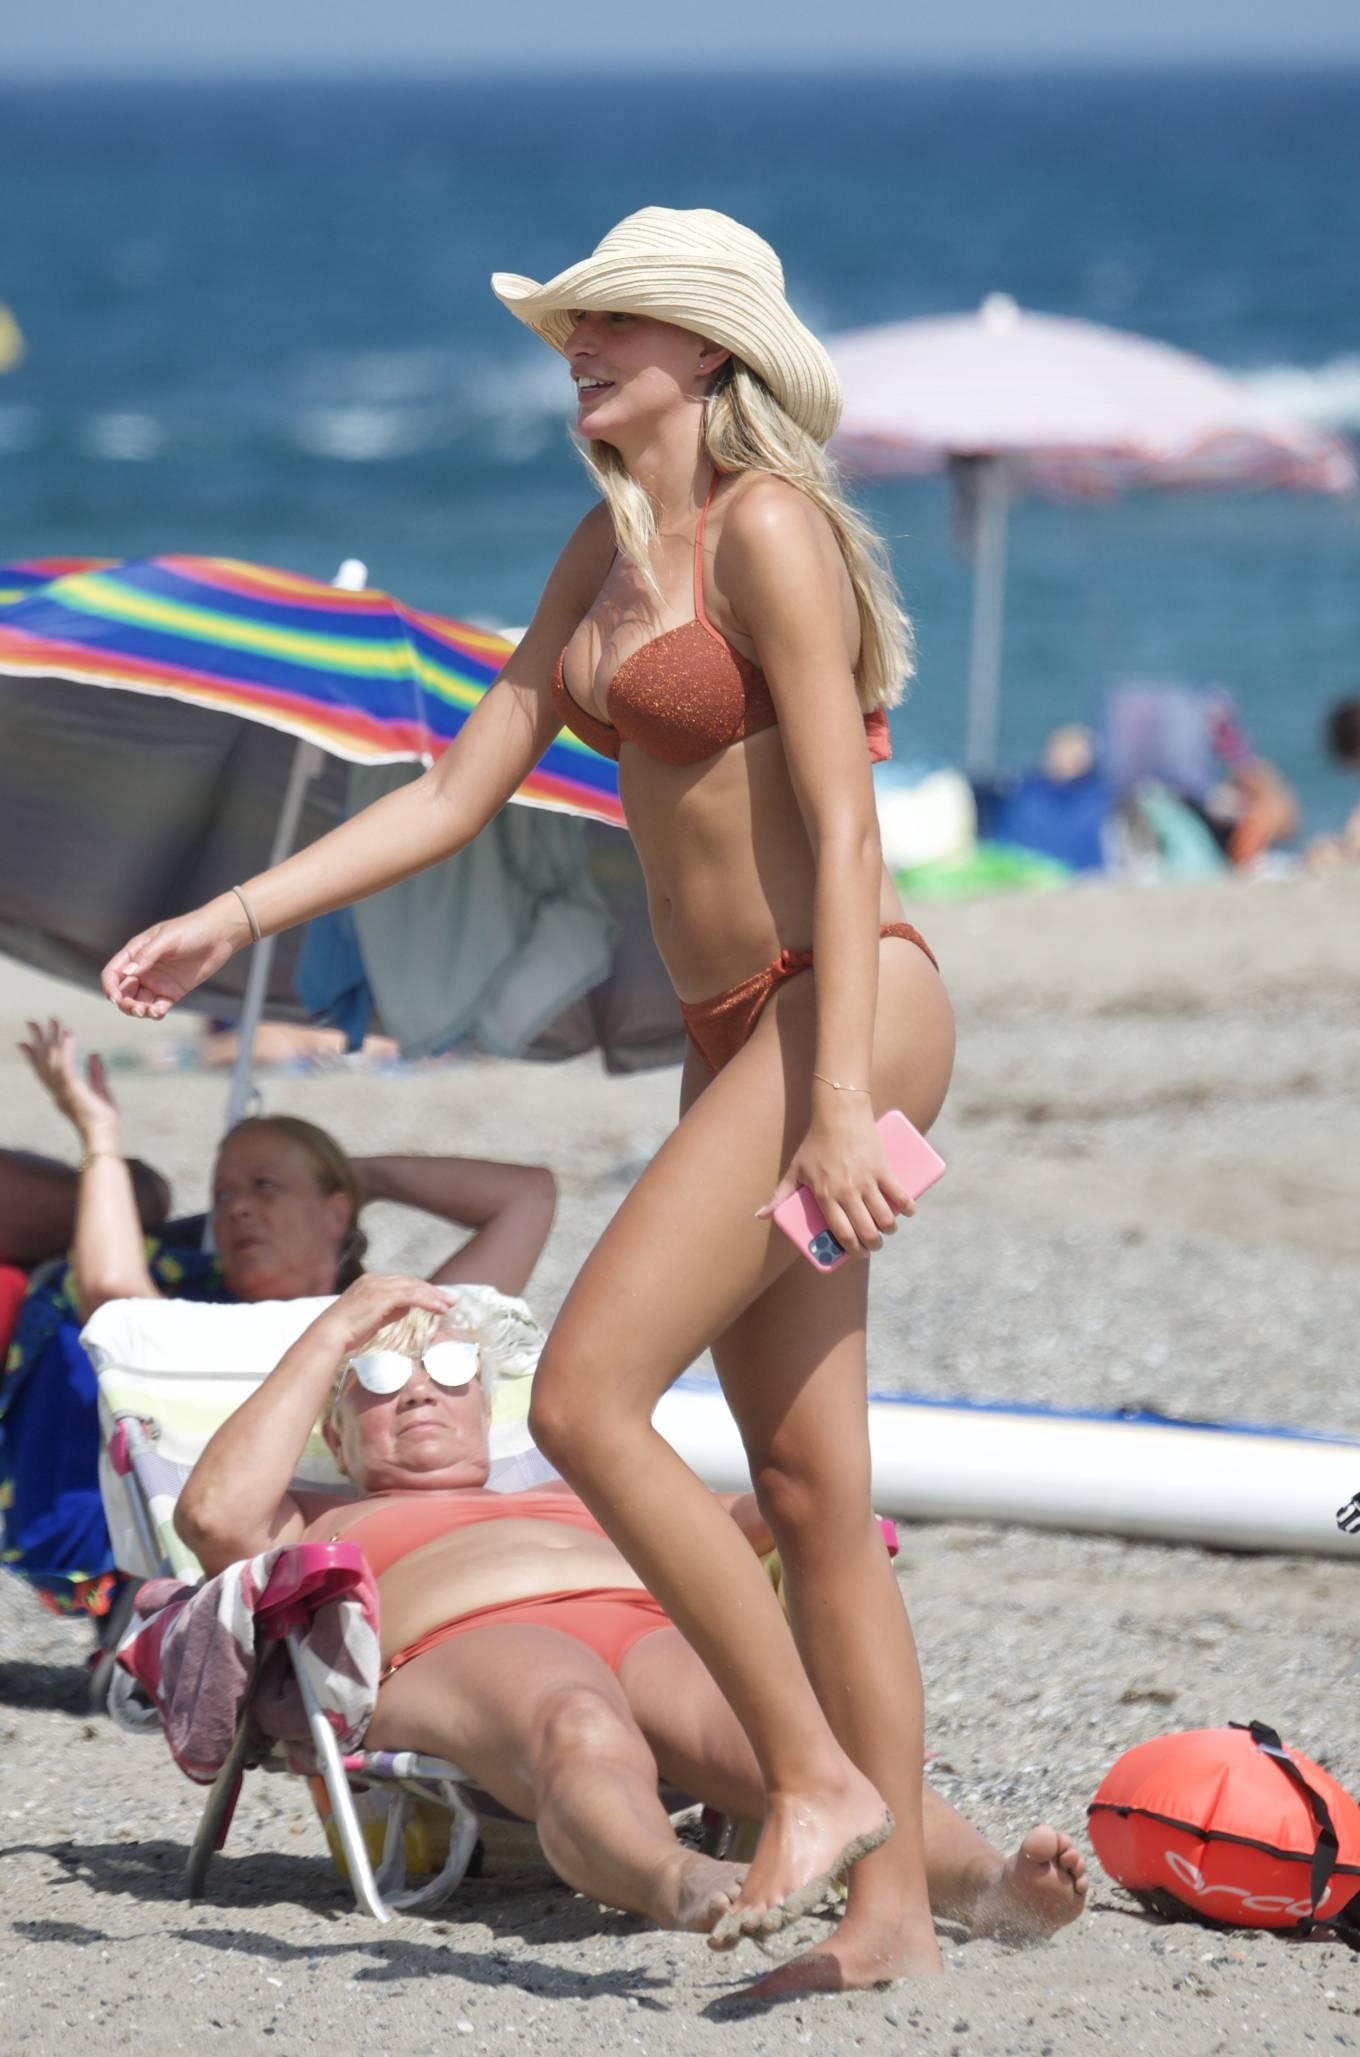 Zara McDermott 2020 : Zara McDermott in Bikini 2020-15